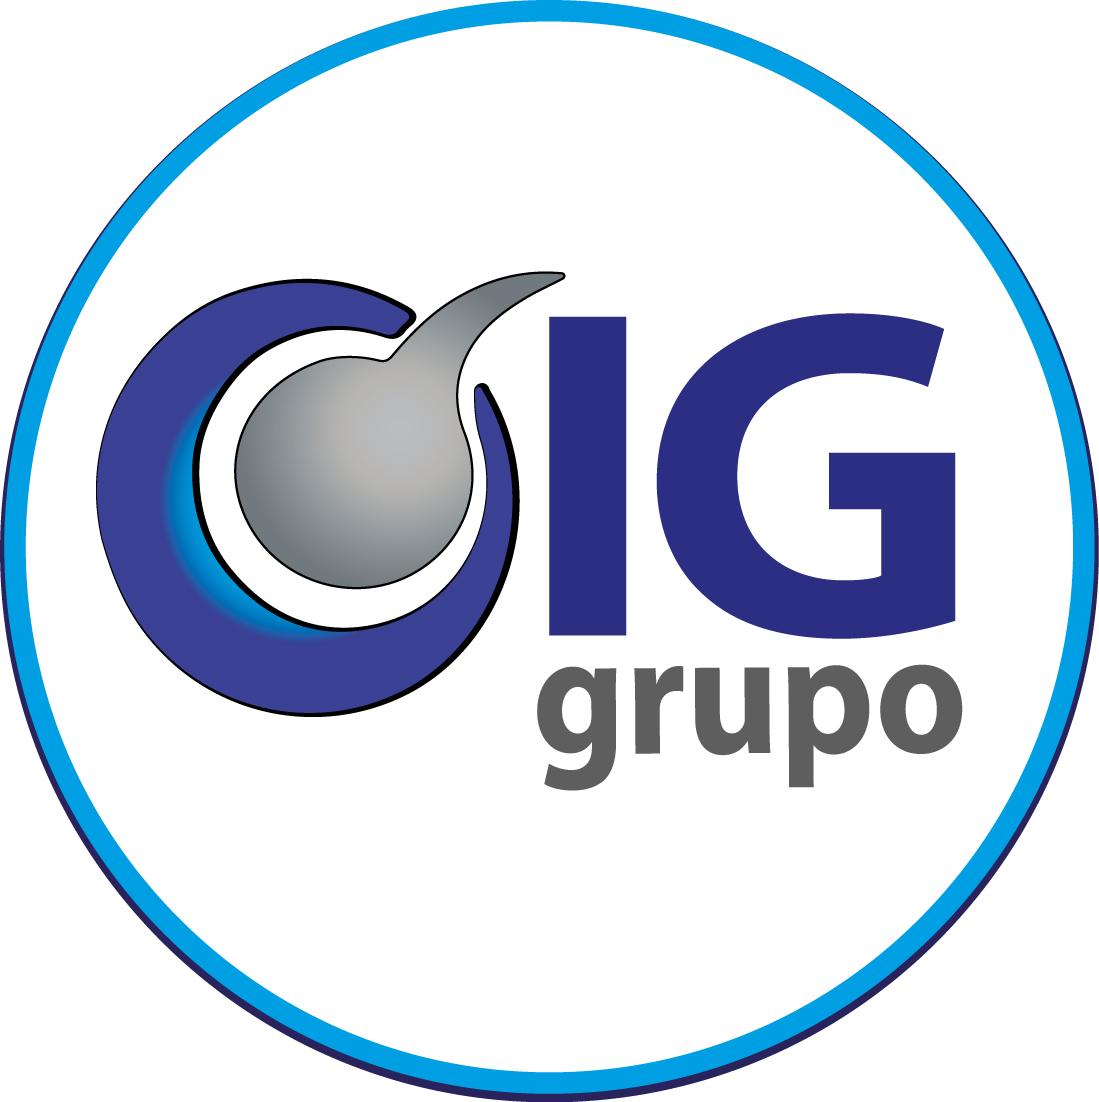 GRUPO IG